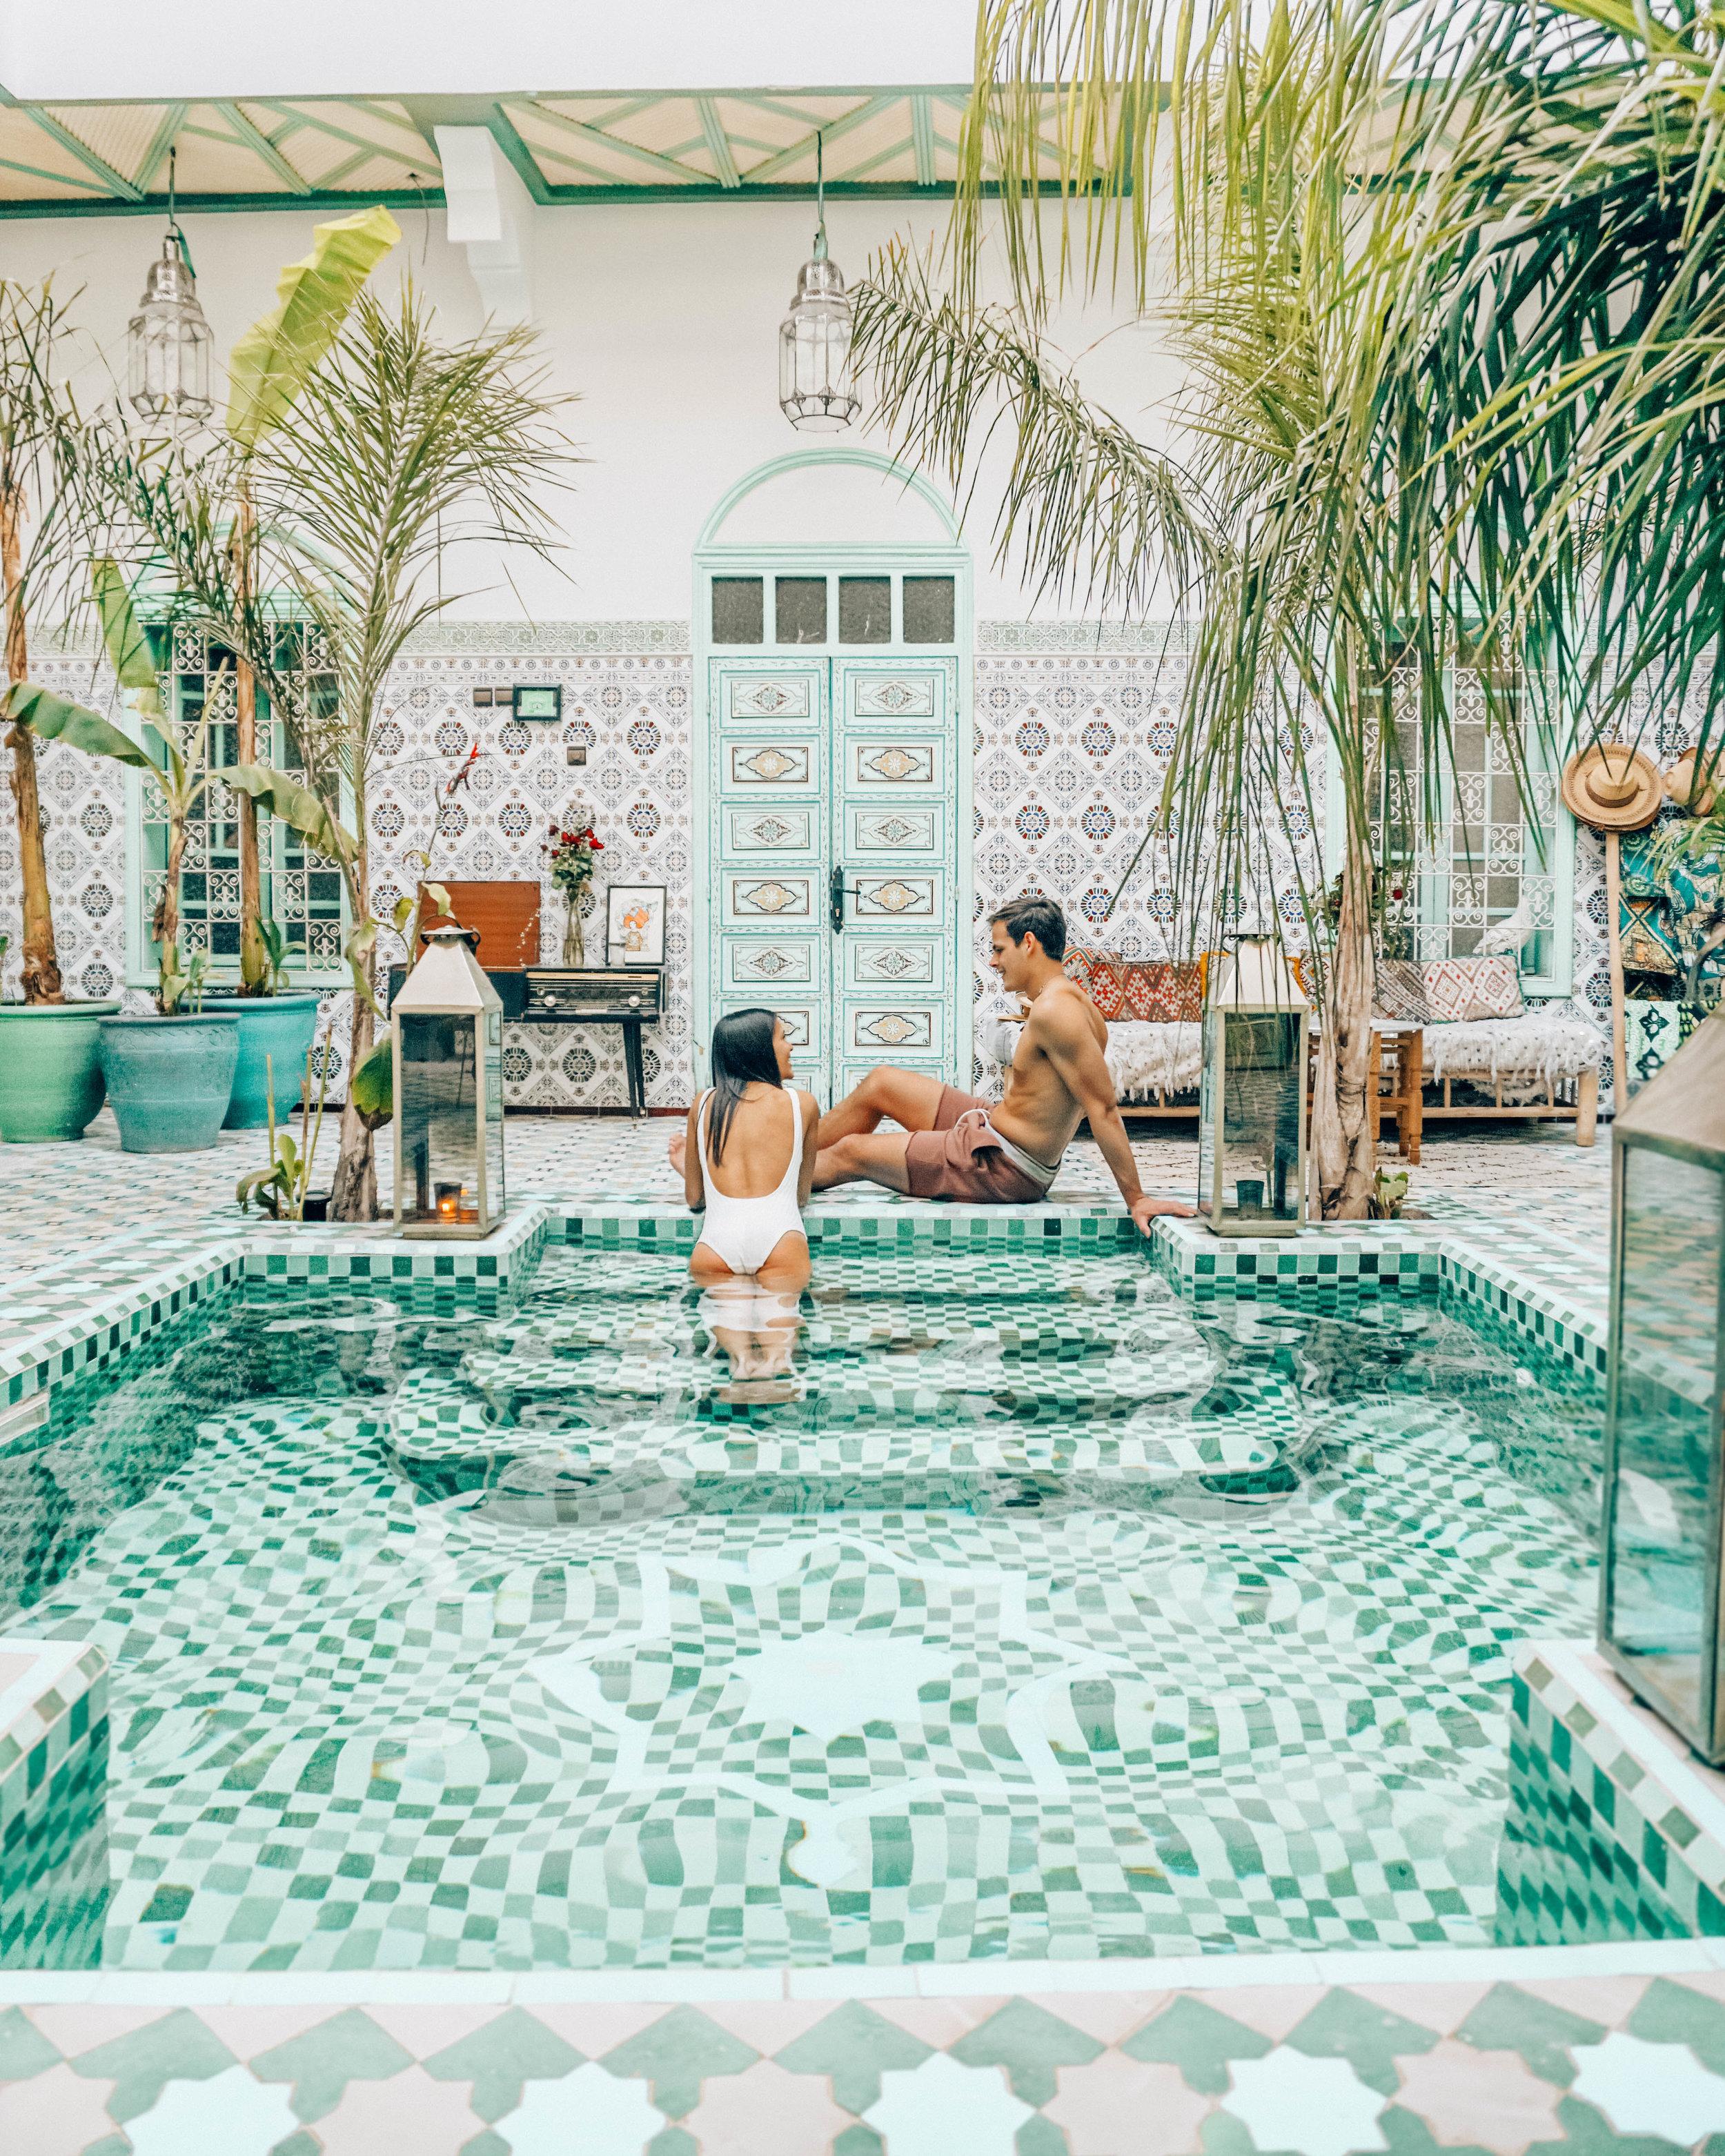 Marruecos3-WLC.jpg